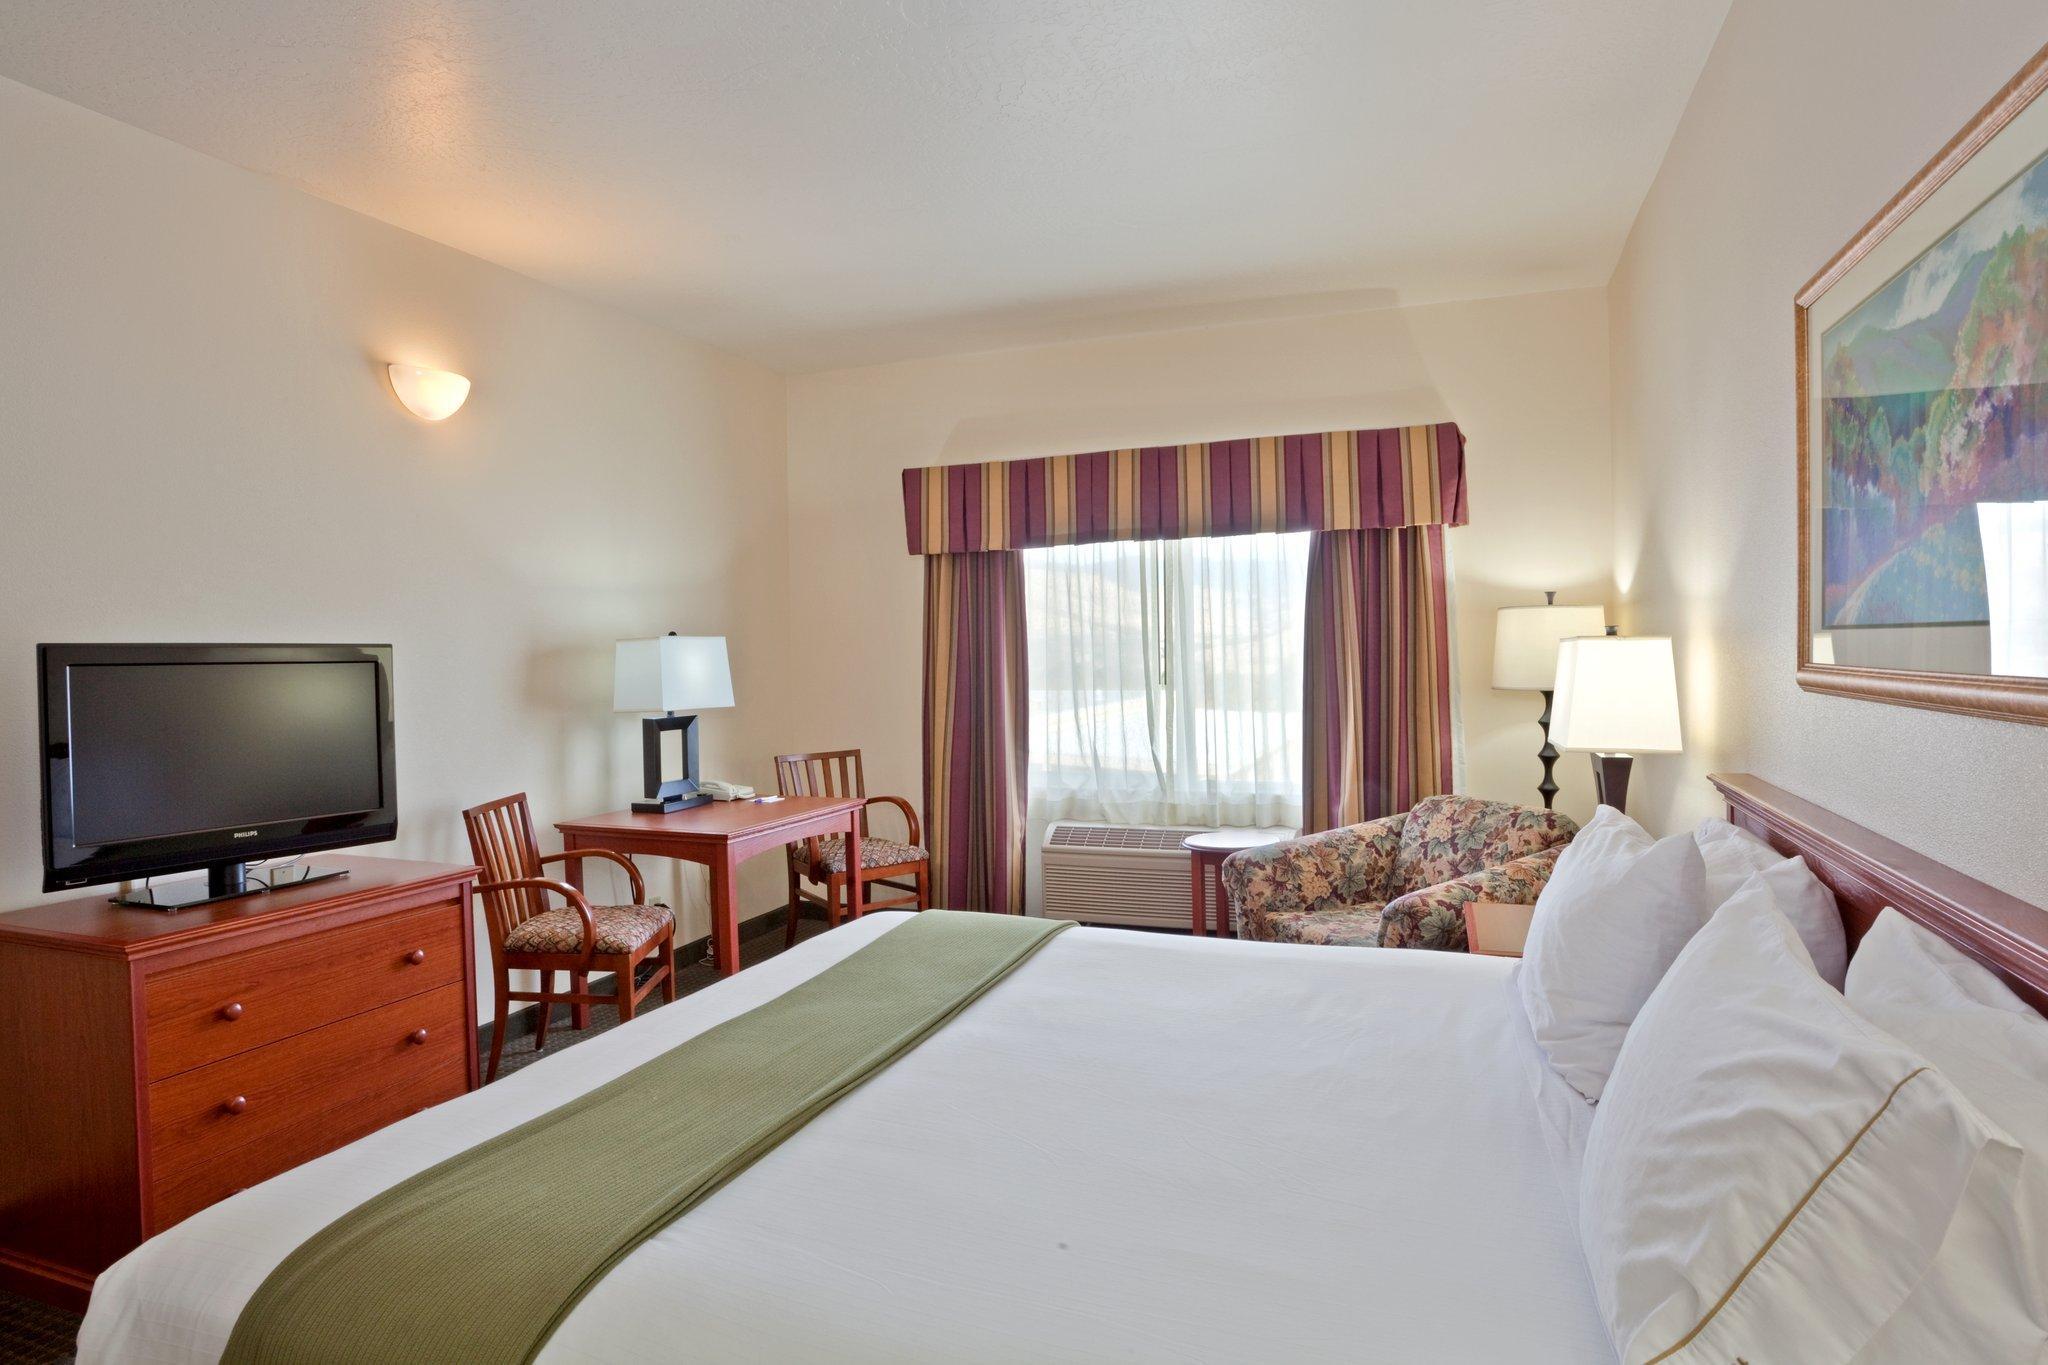 Holiday Inn Express Hotel & Suites Ashland